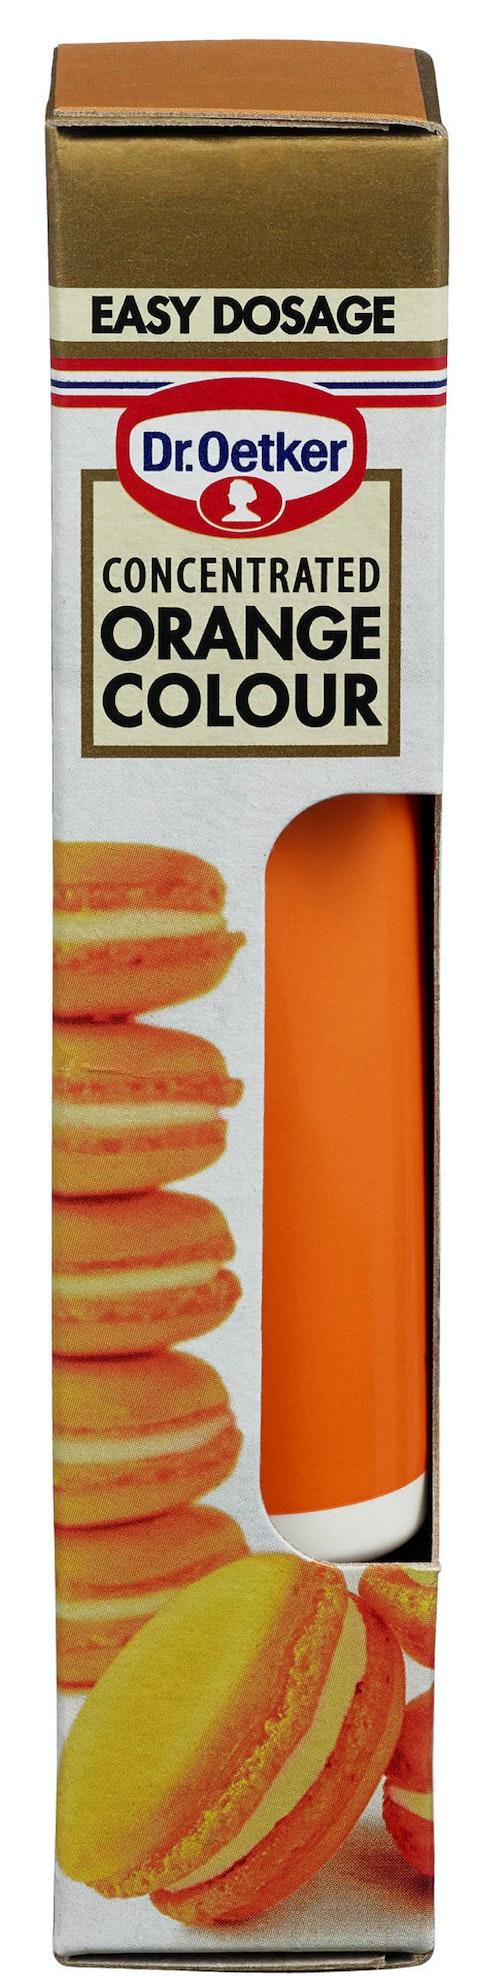 Dr. Oetker Oransje Geléfarge Konsentrert, 15 g